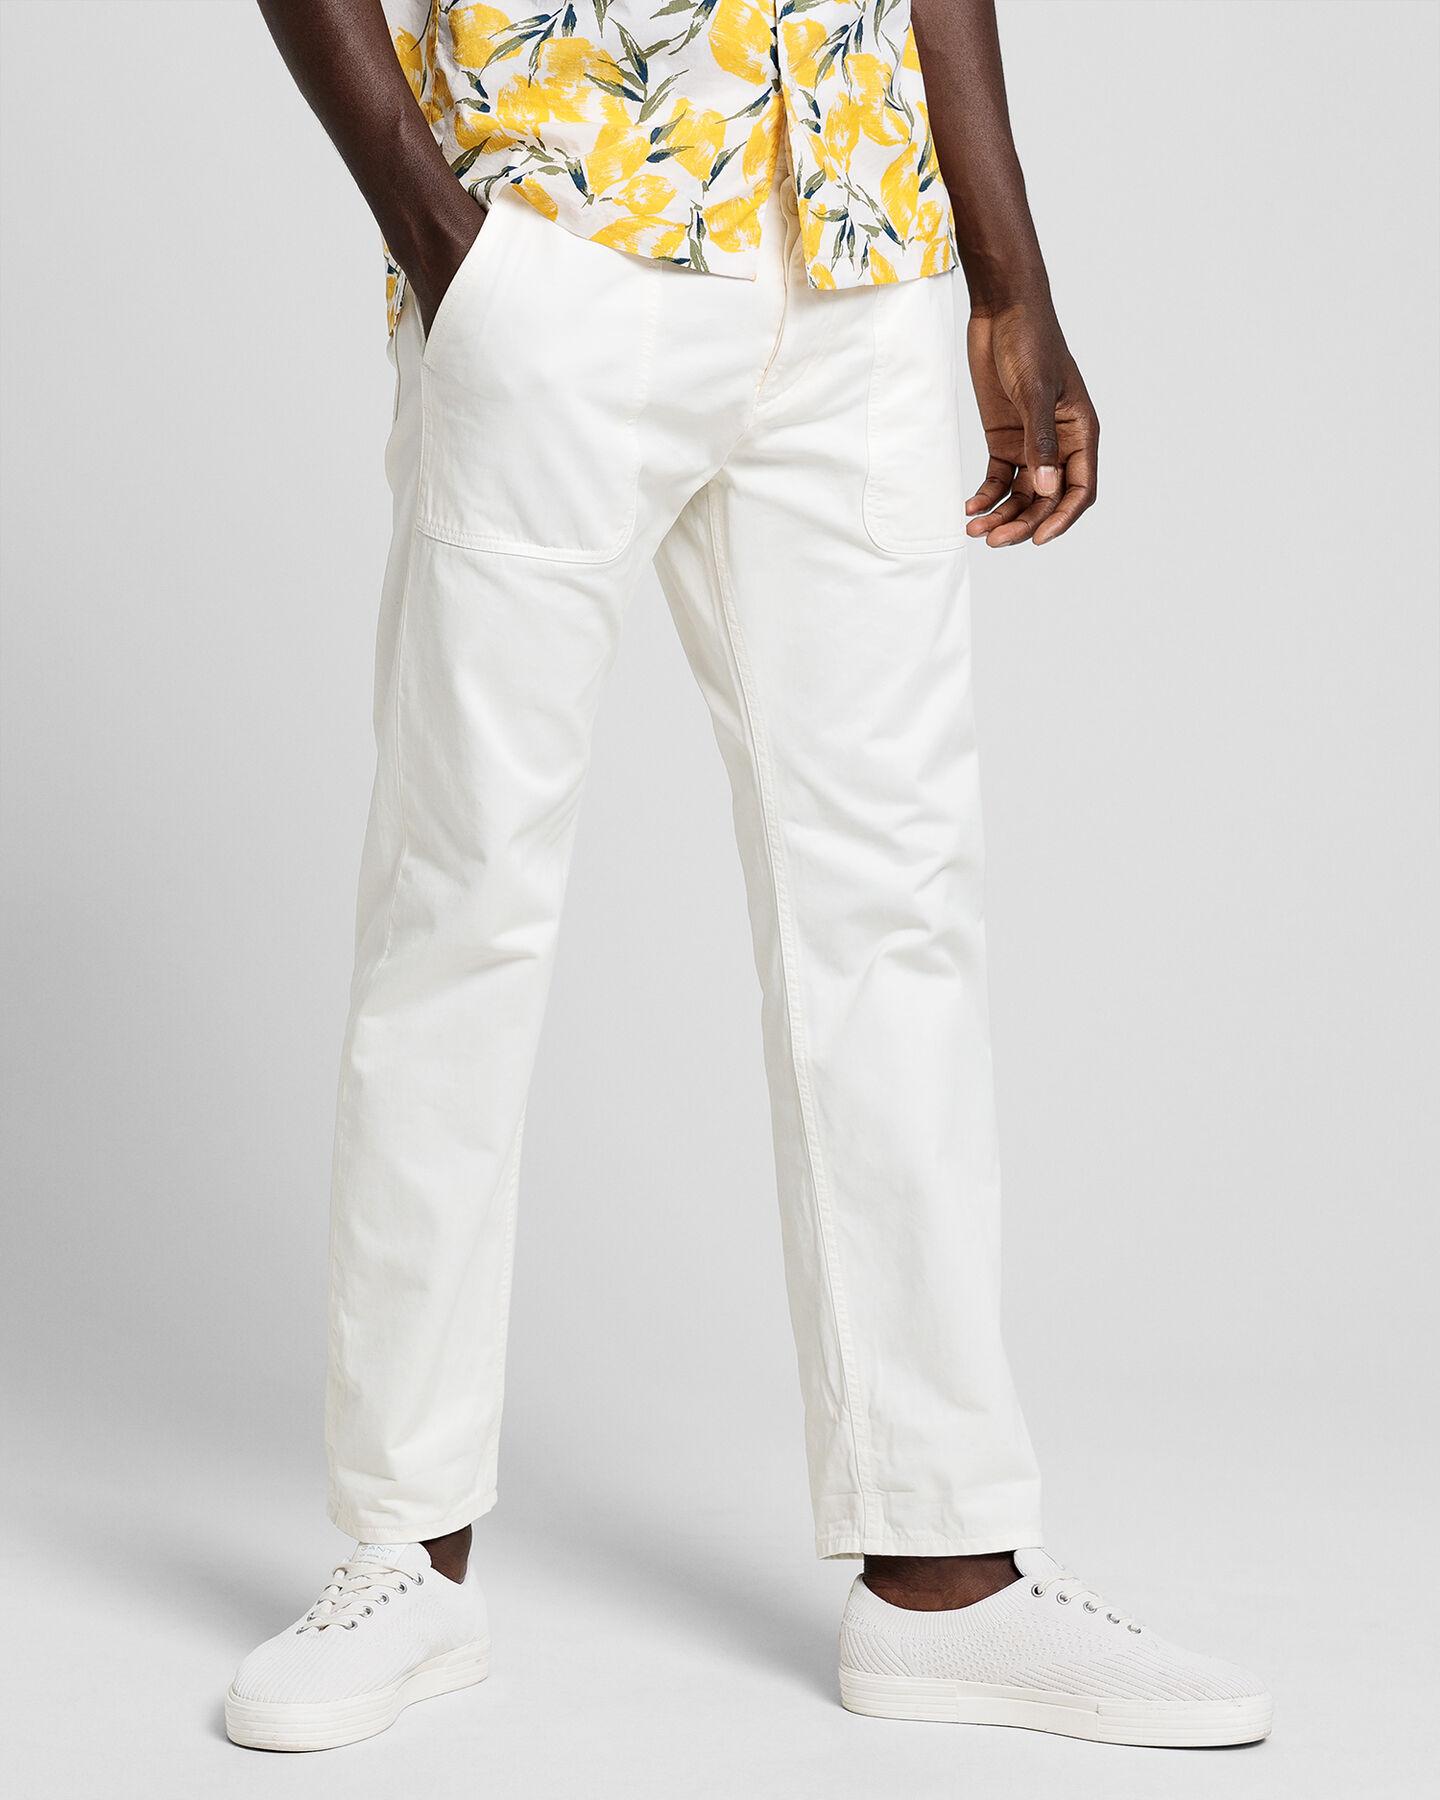 Coastal Selvedge Jeans